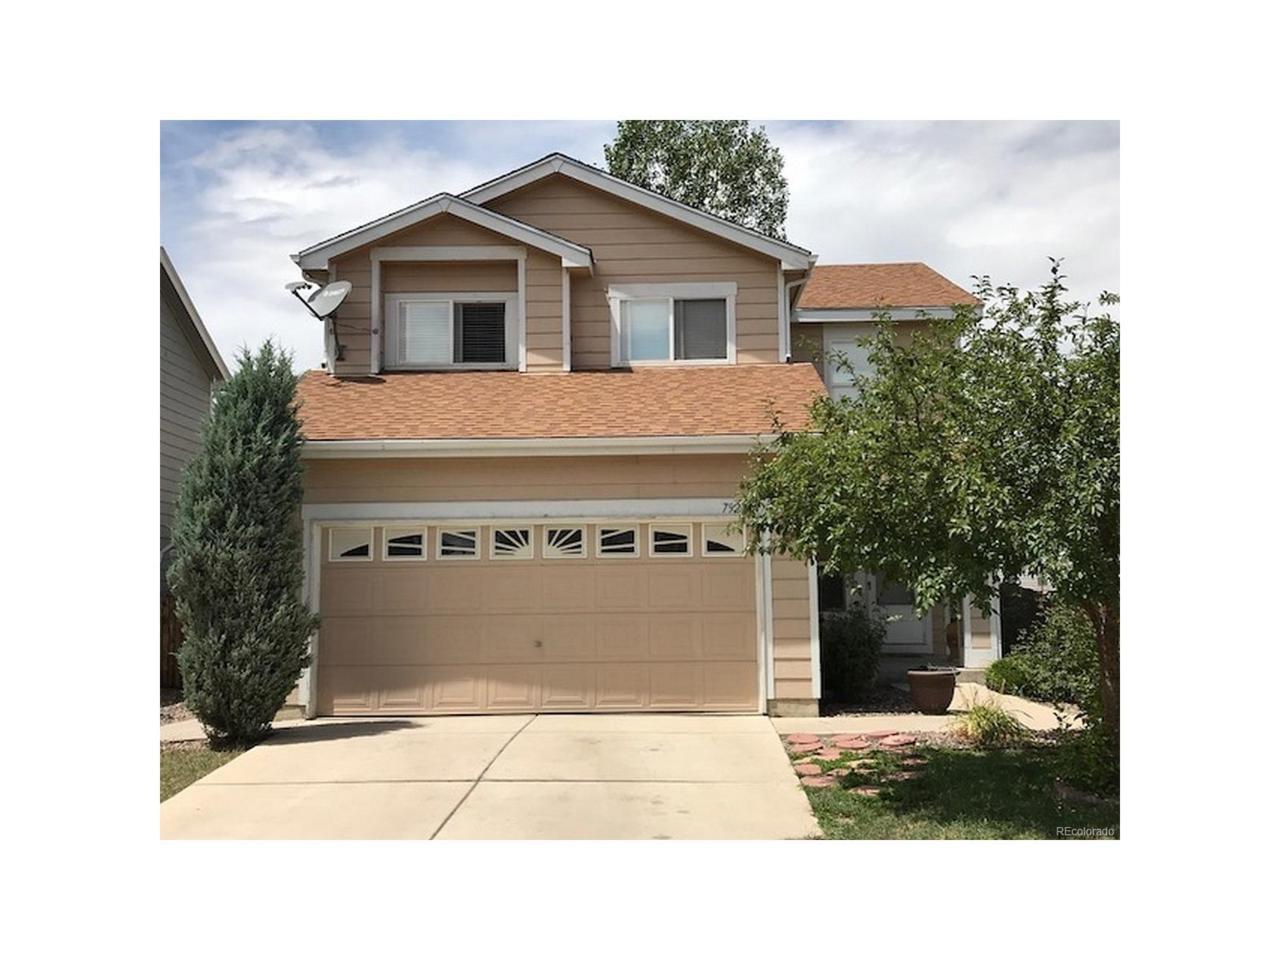 7927 Lafayette Way, Denver, CO 80229 (MLS #9499194) :: 8z Real Estate